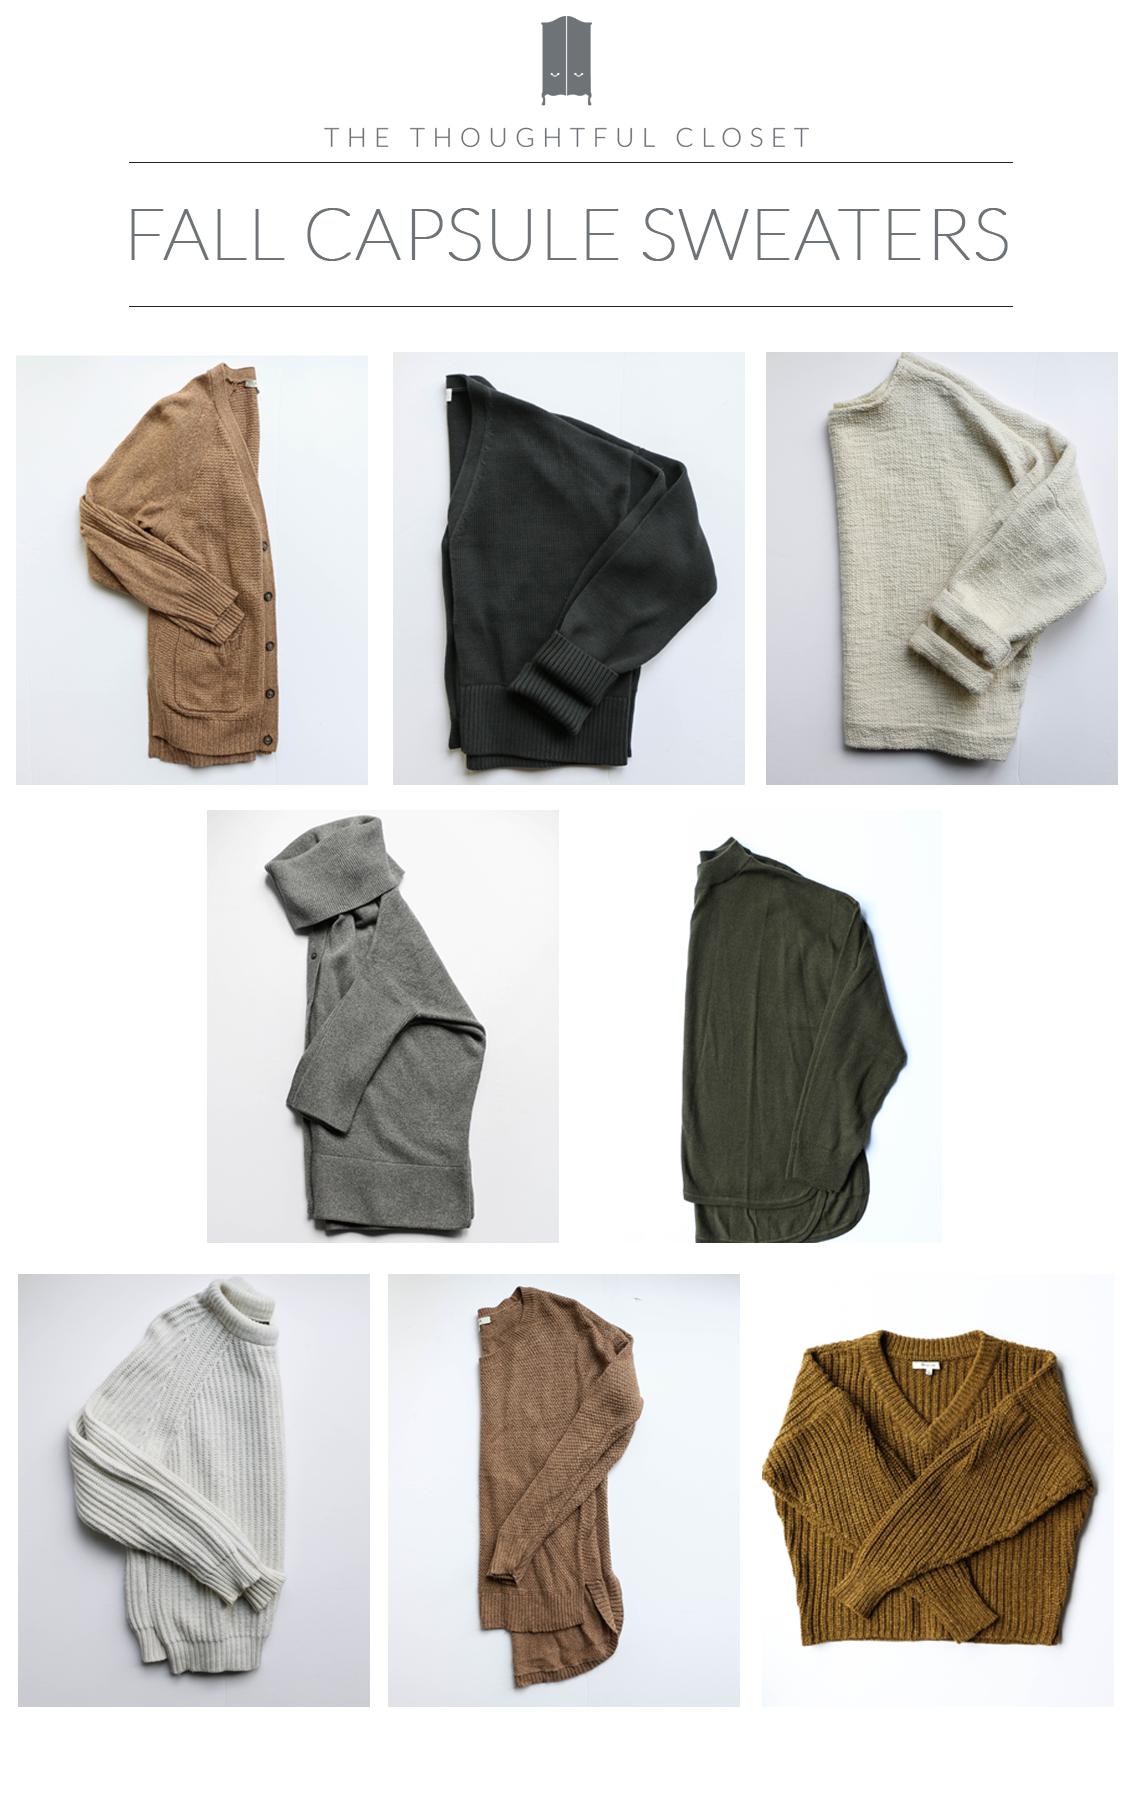 closet template_fall-capsule-sweaters.png